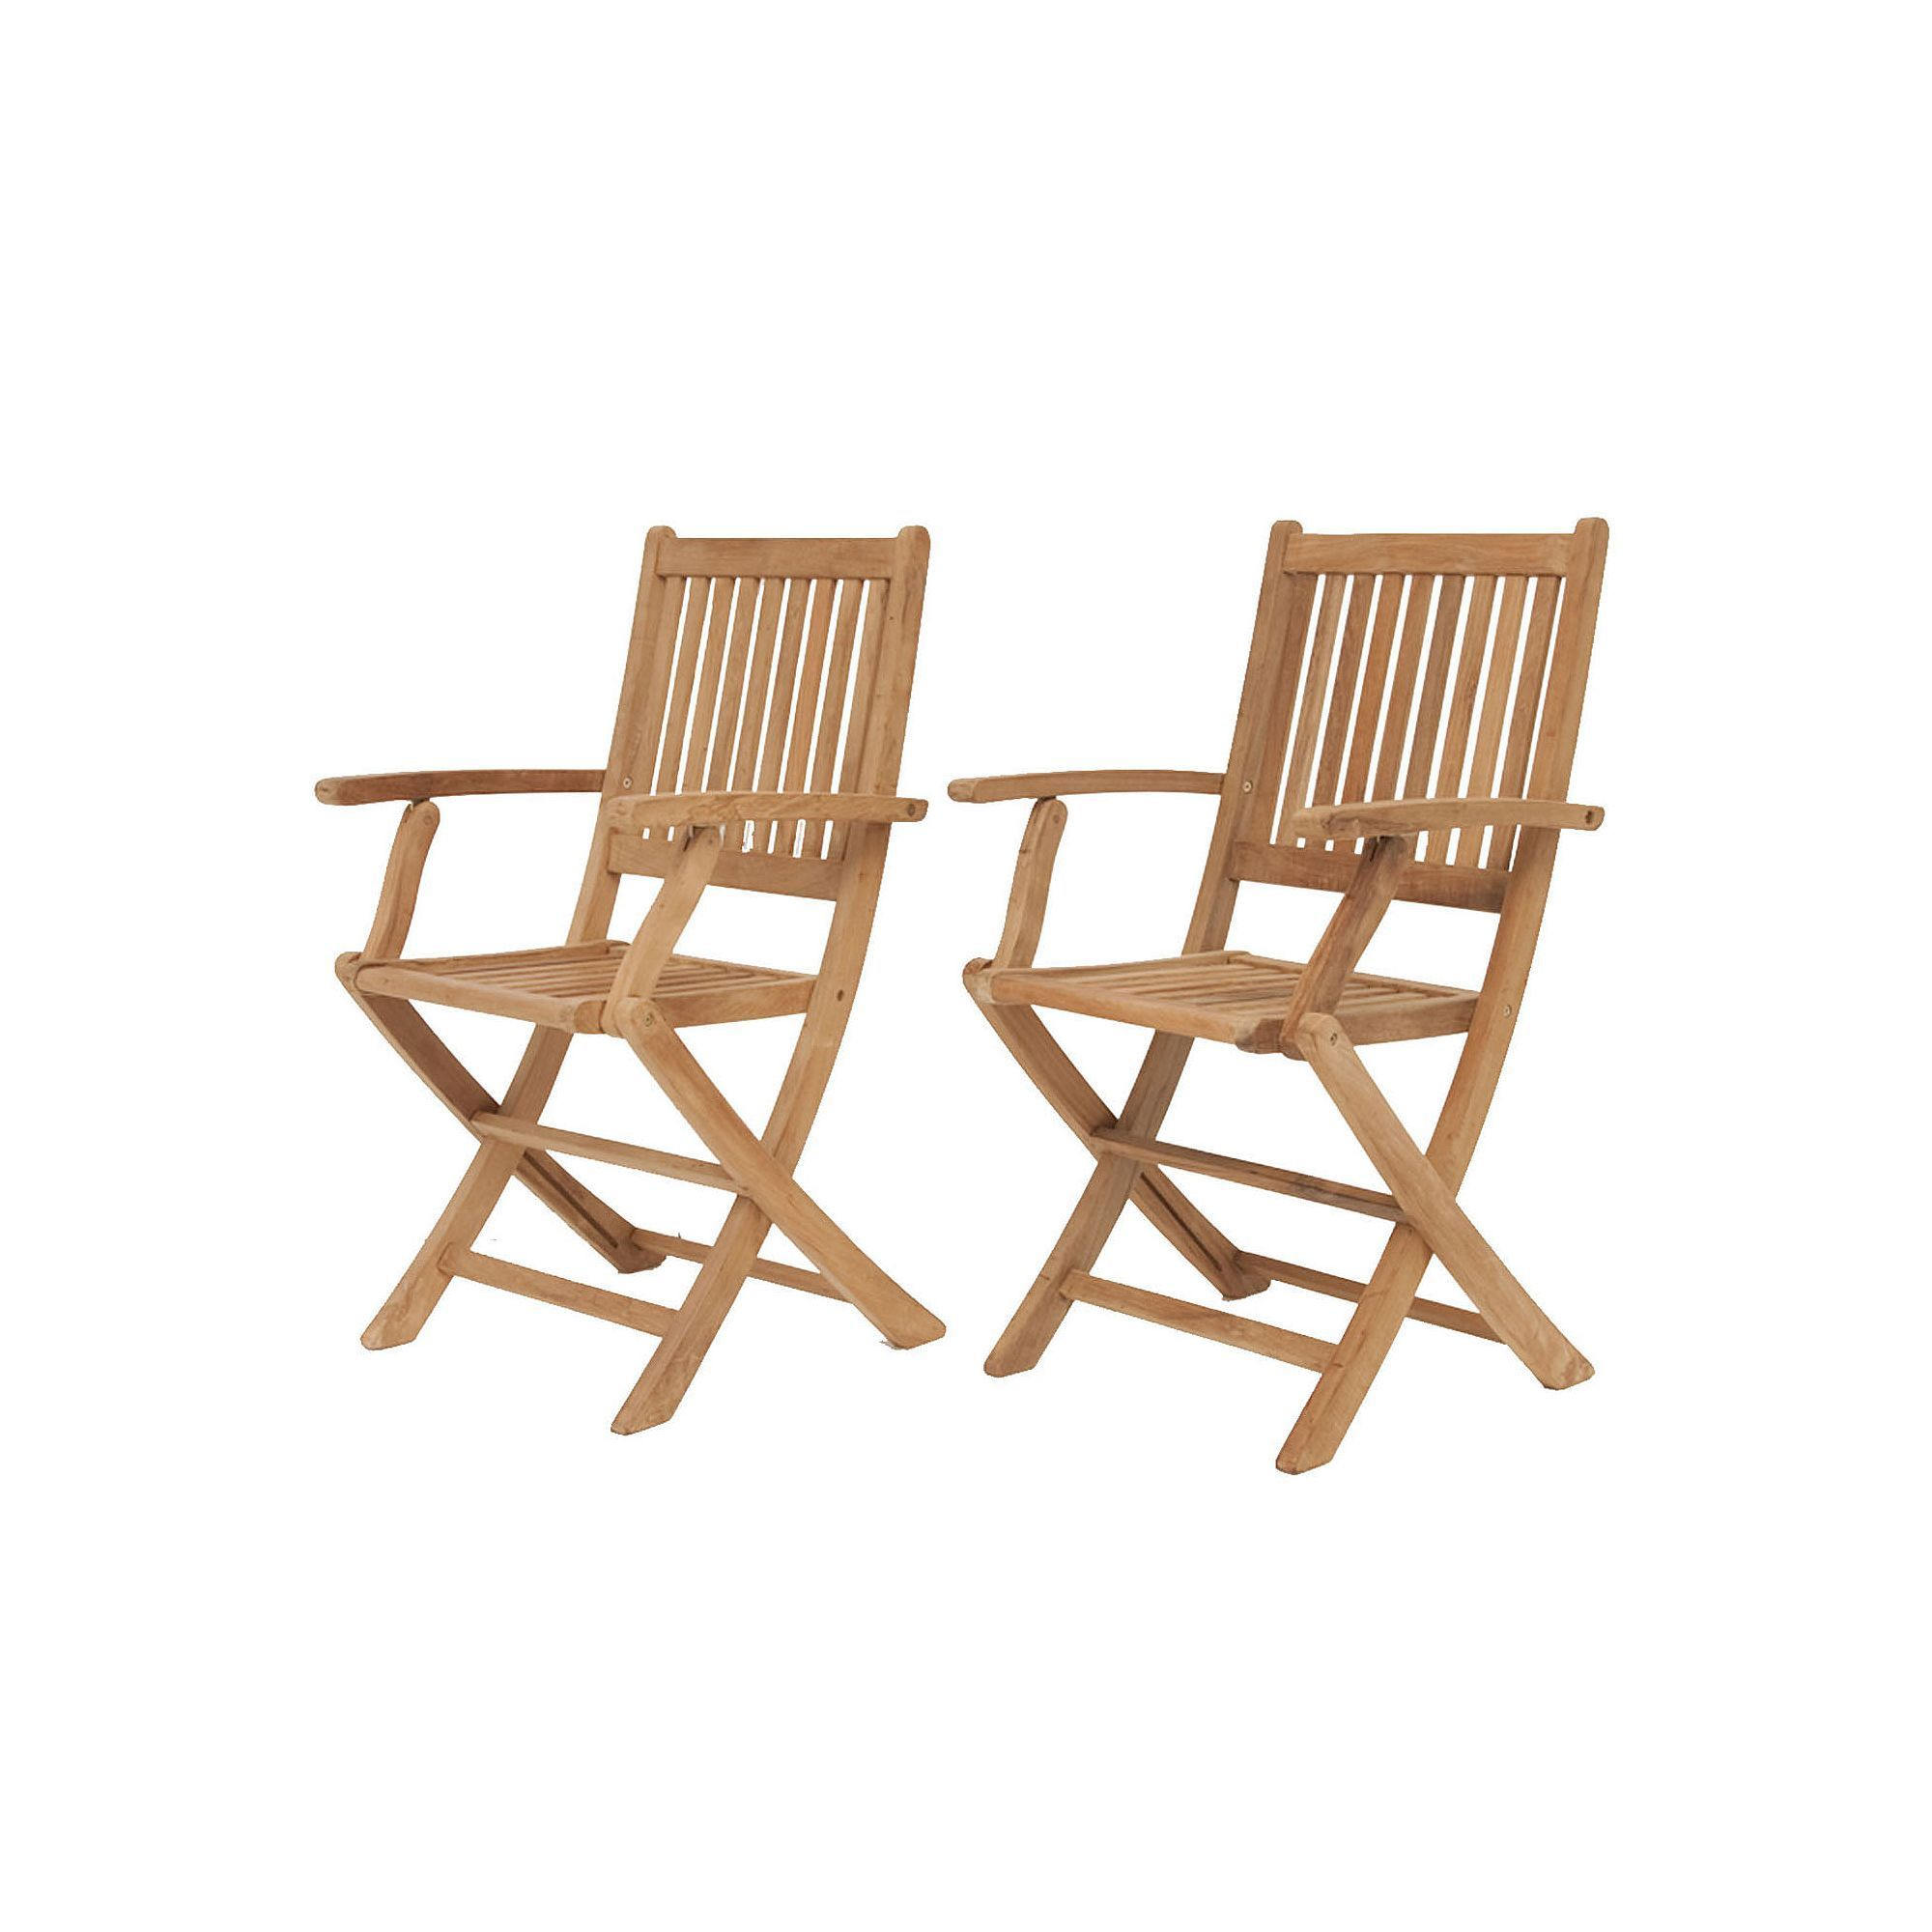 Amazonia Teak Yogya 2 pc Outdoor Folding Arm Chair Set Brown